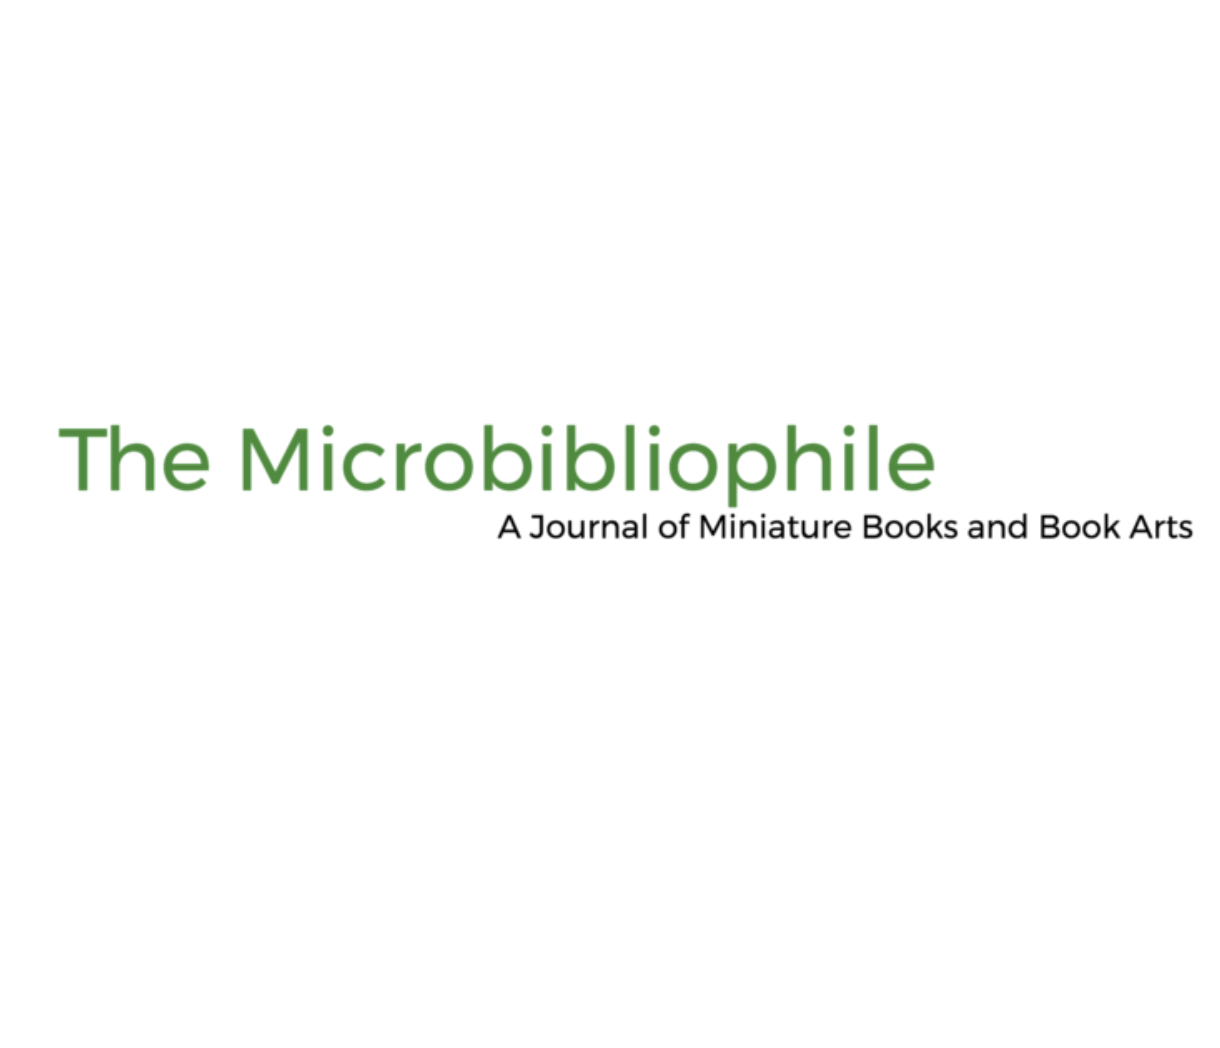 The Microbibliophile logo